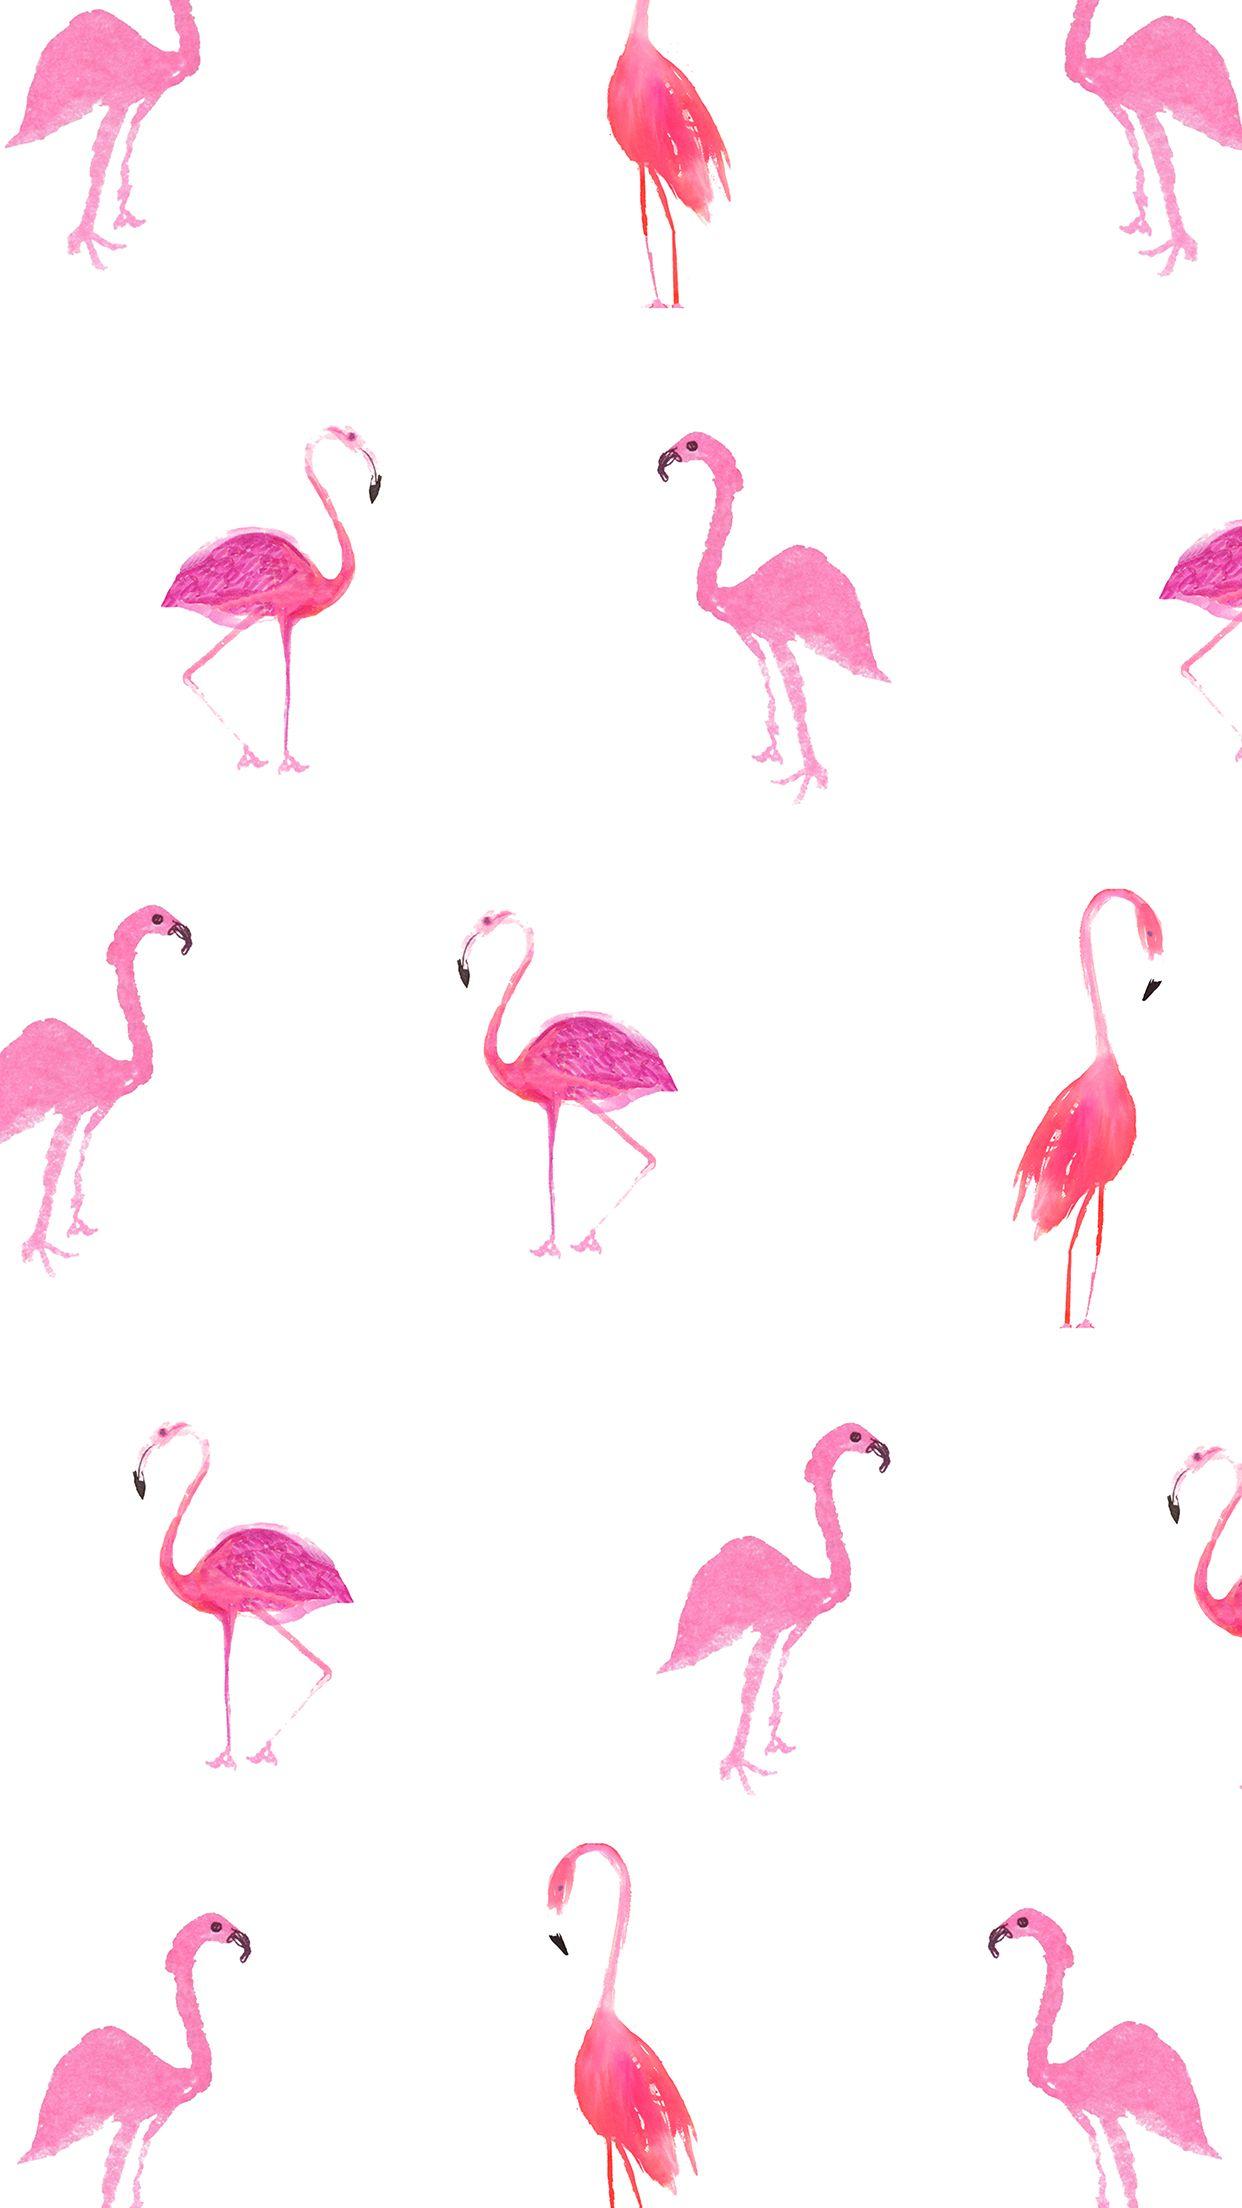 Background flamingo flamingos iphone wallpaper wallpaper - Mobile Wallpaper For Swimsuit Season Front Main